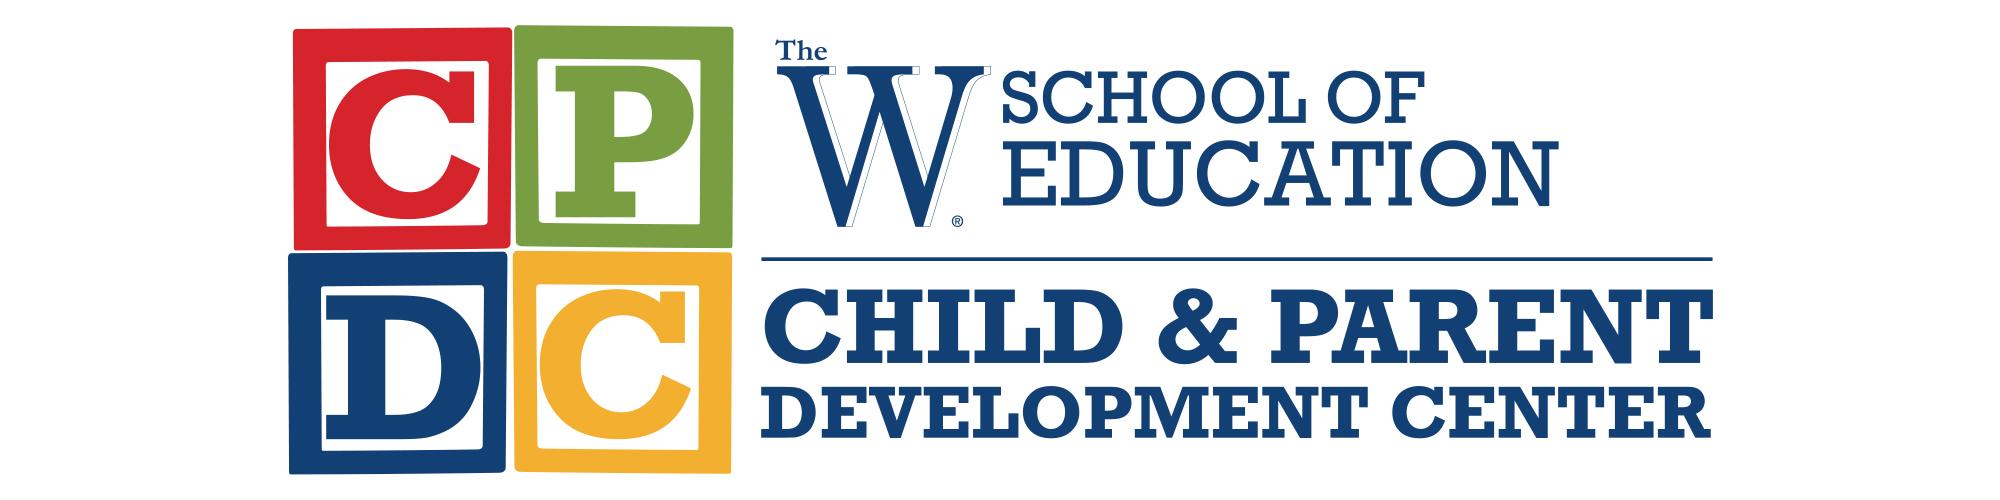 Child & Parent Development Center: School of Education